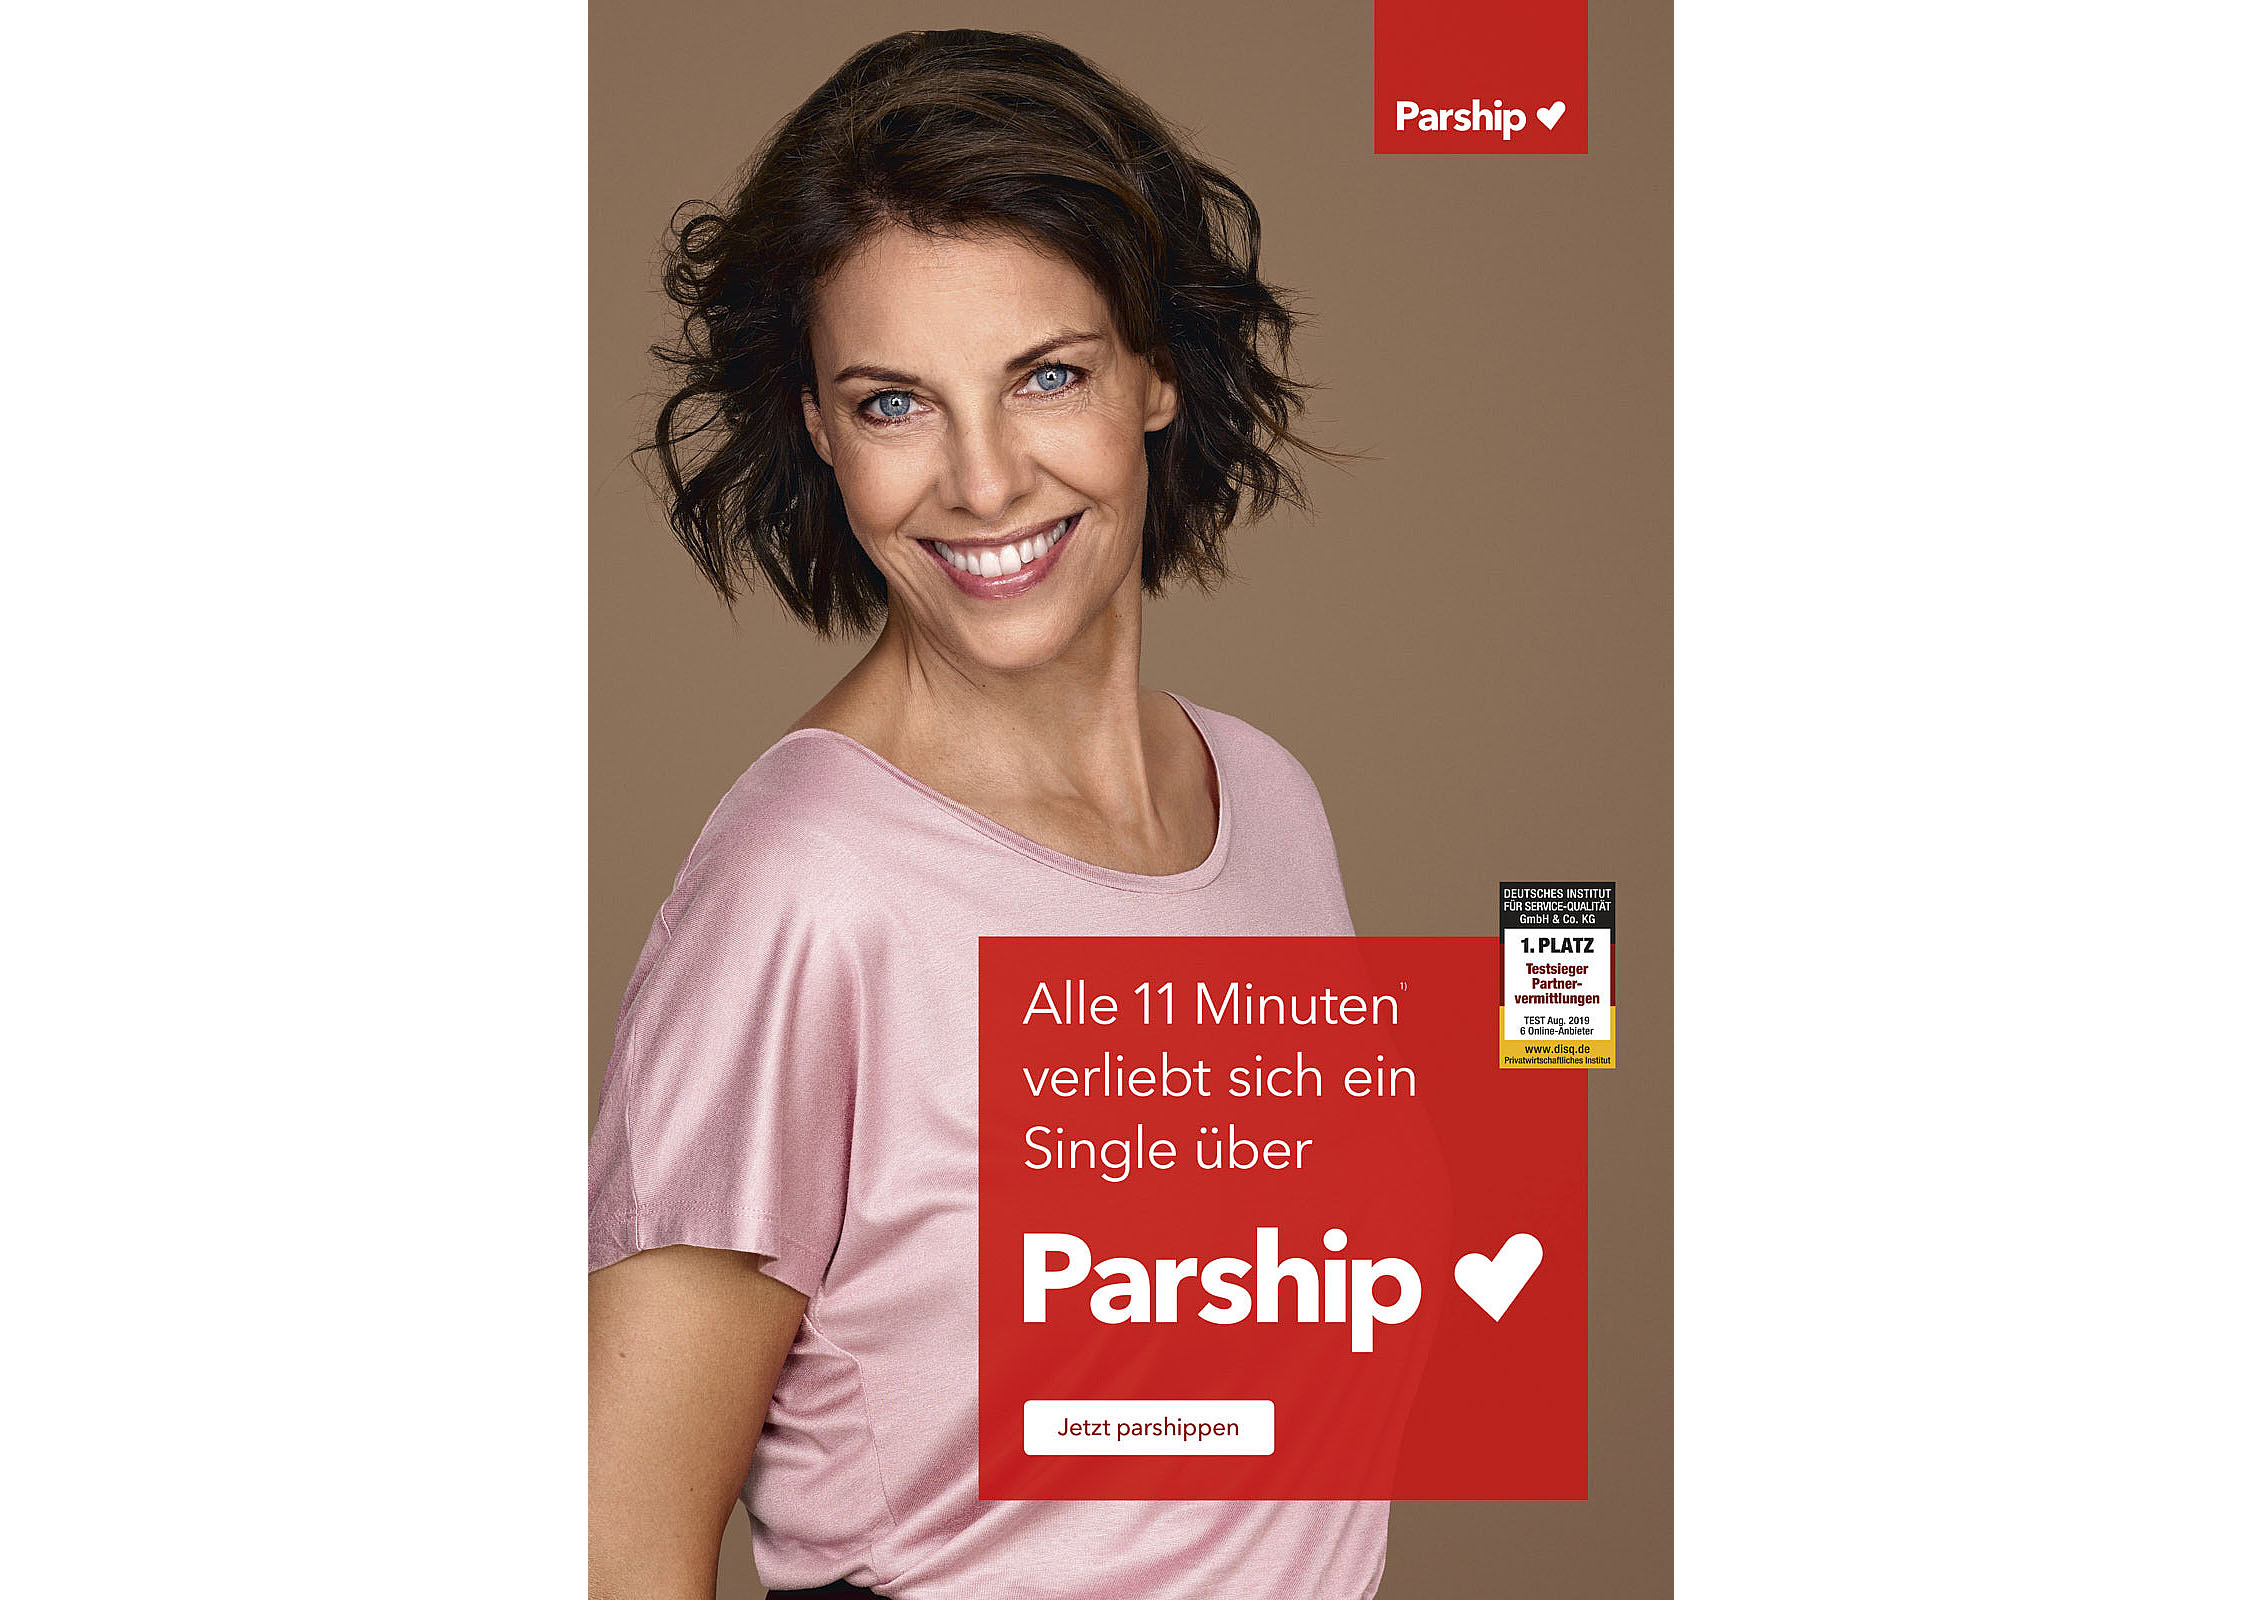 PS_Herbstkampagne2019_Plakate_CLP_Angela_Landscape